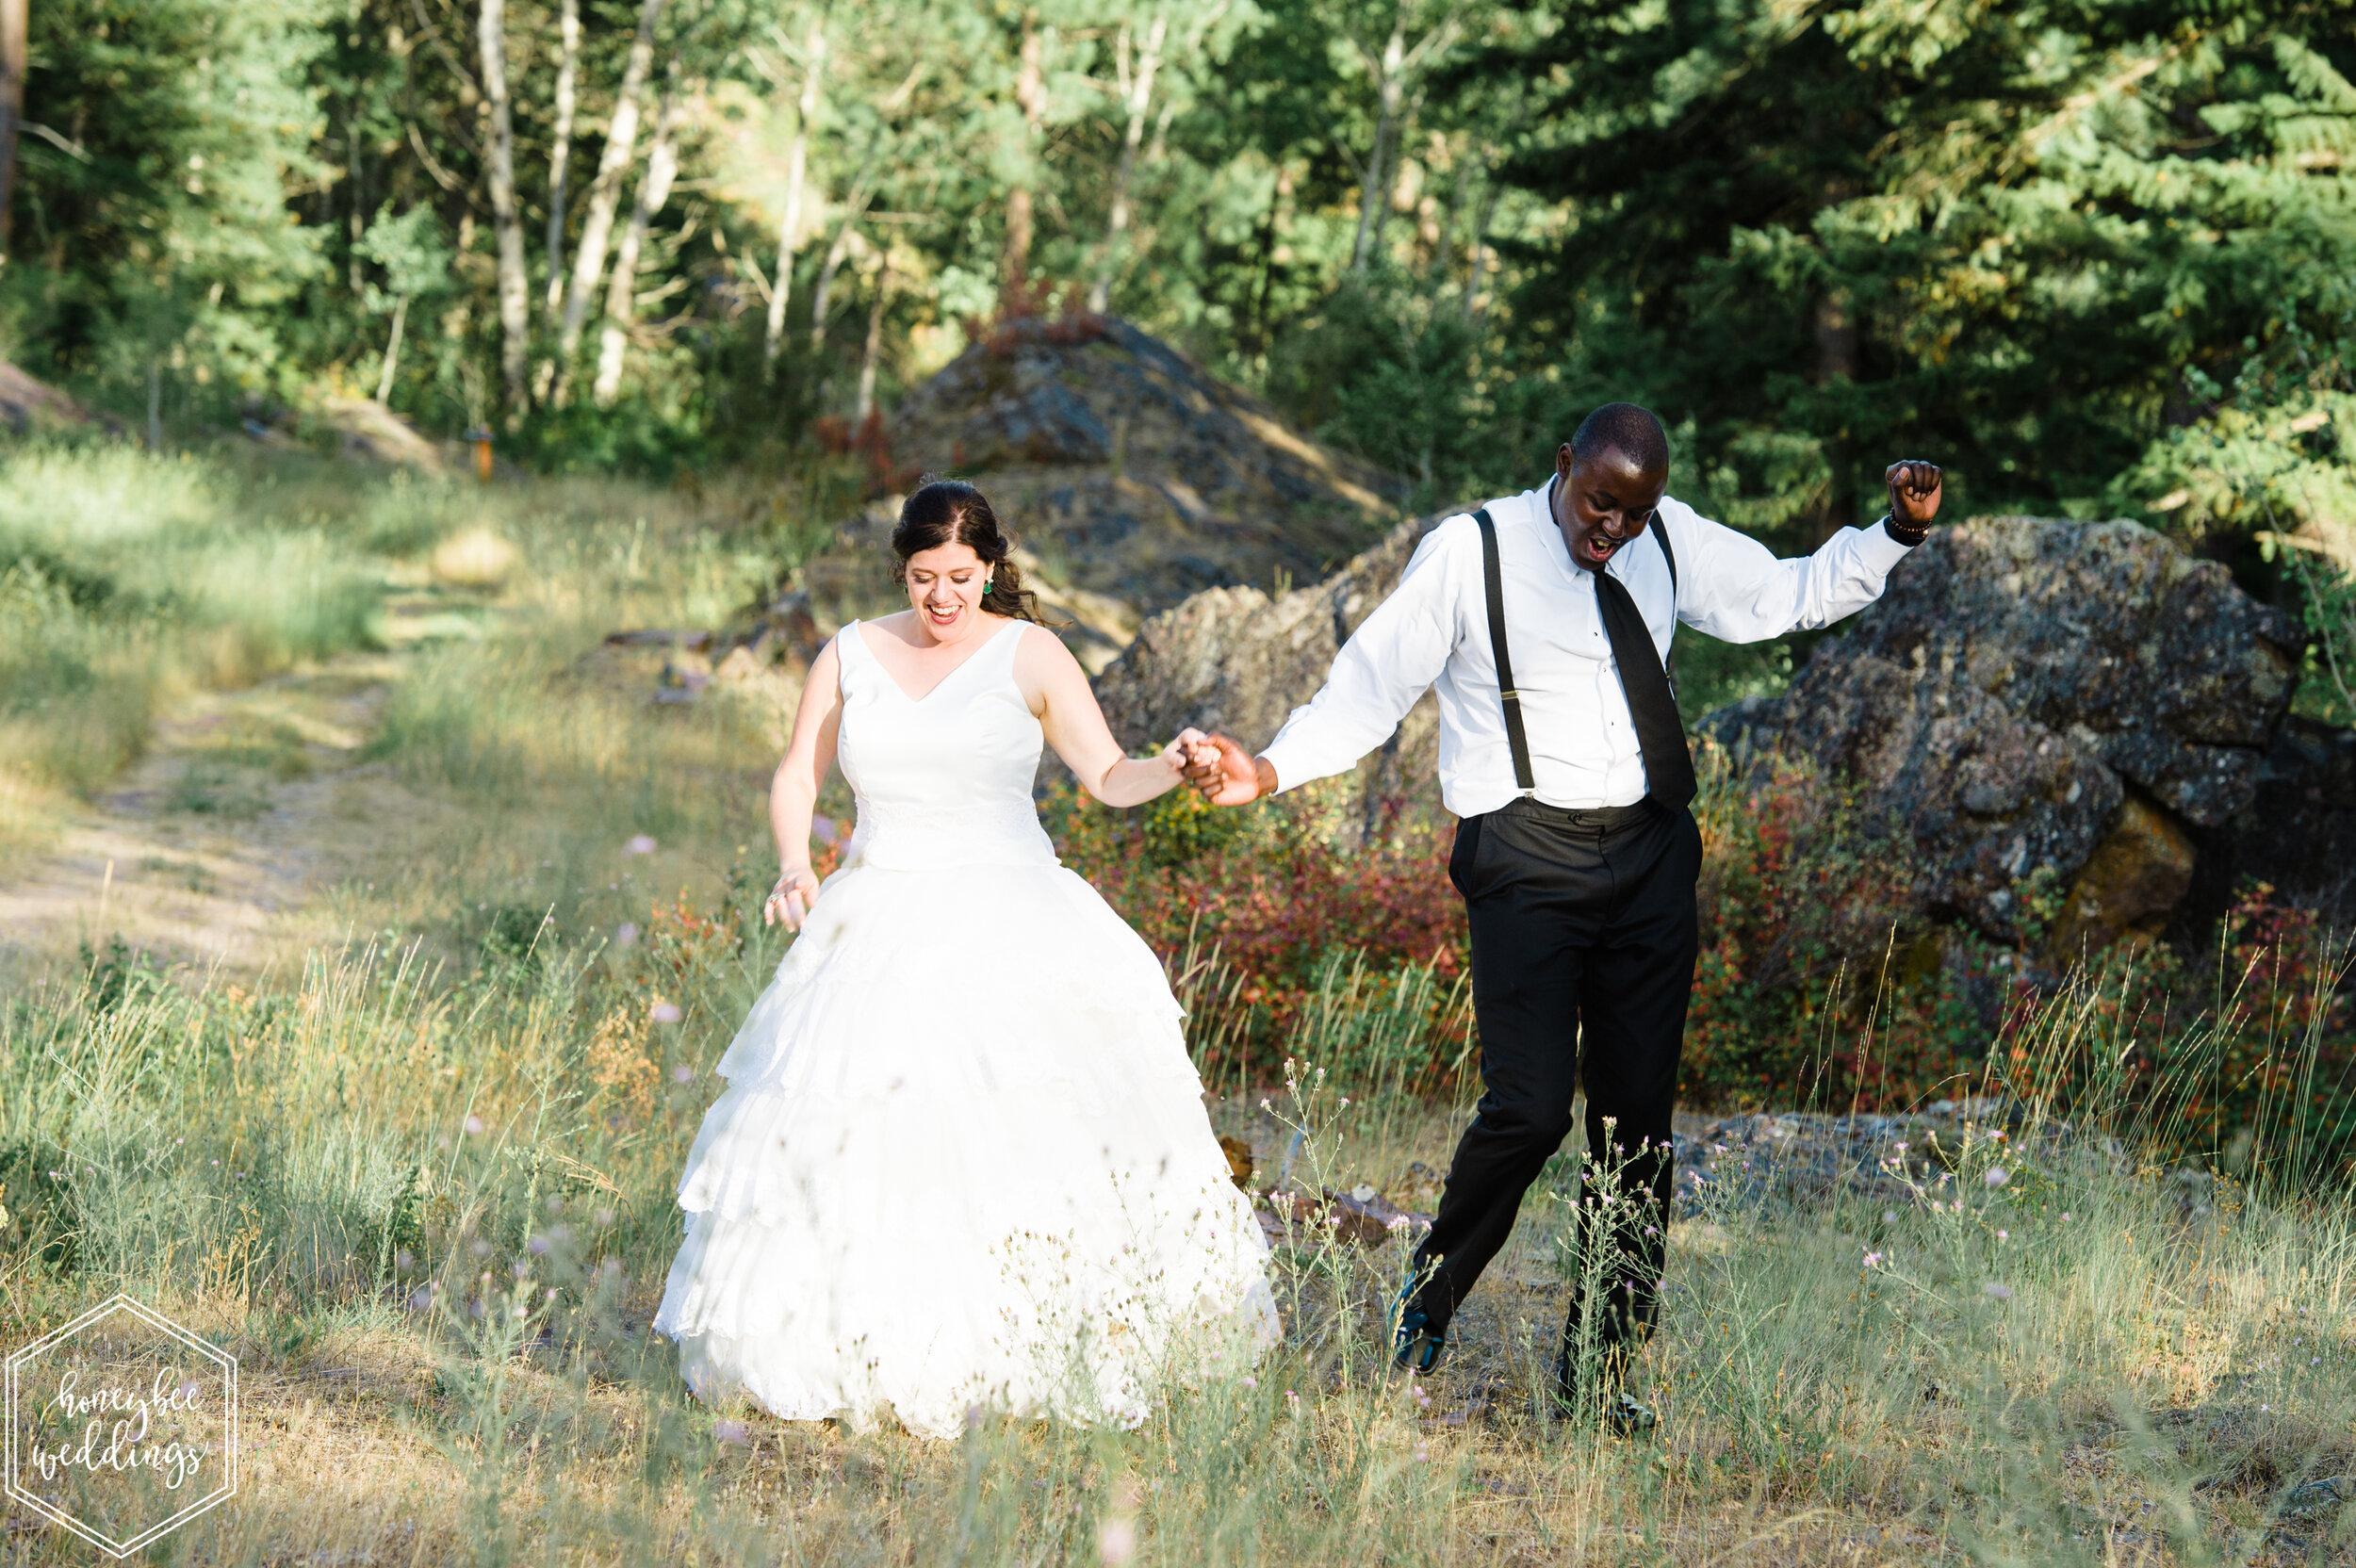 178White Raven Wedding_Montana Wedding Photographer_Rebekah & Likom_Honeybee Weddings_July 27, 2019-529.jpg